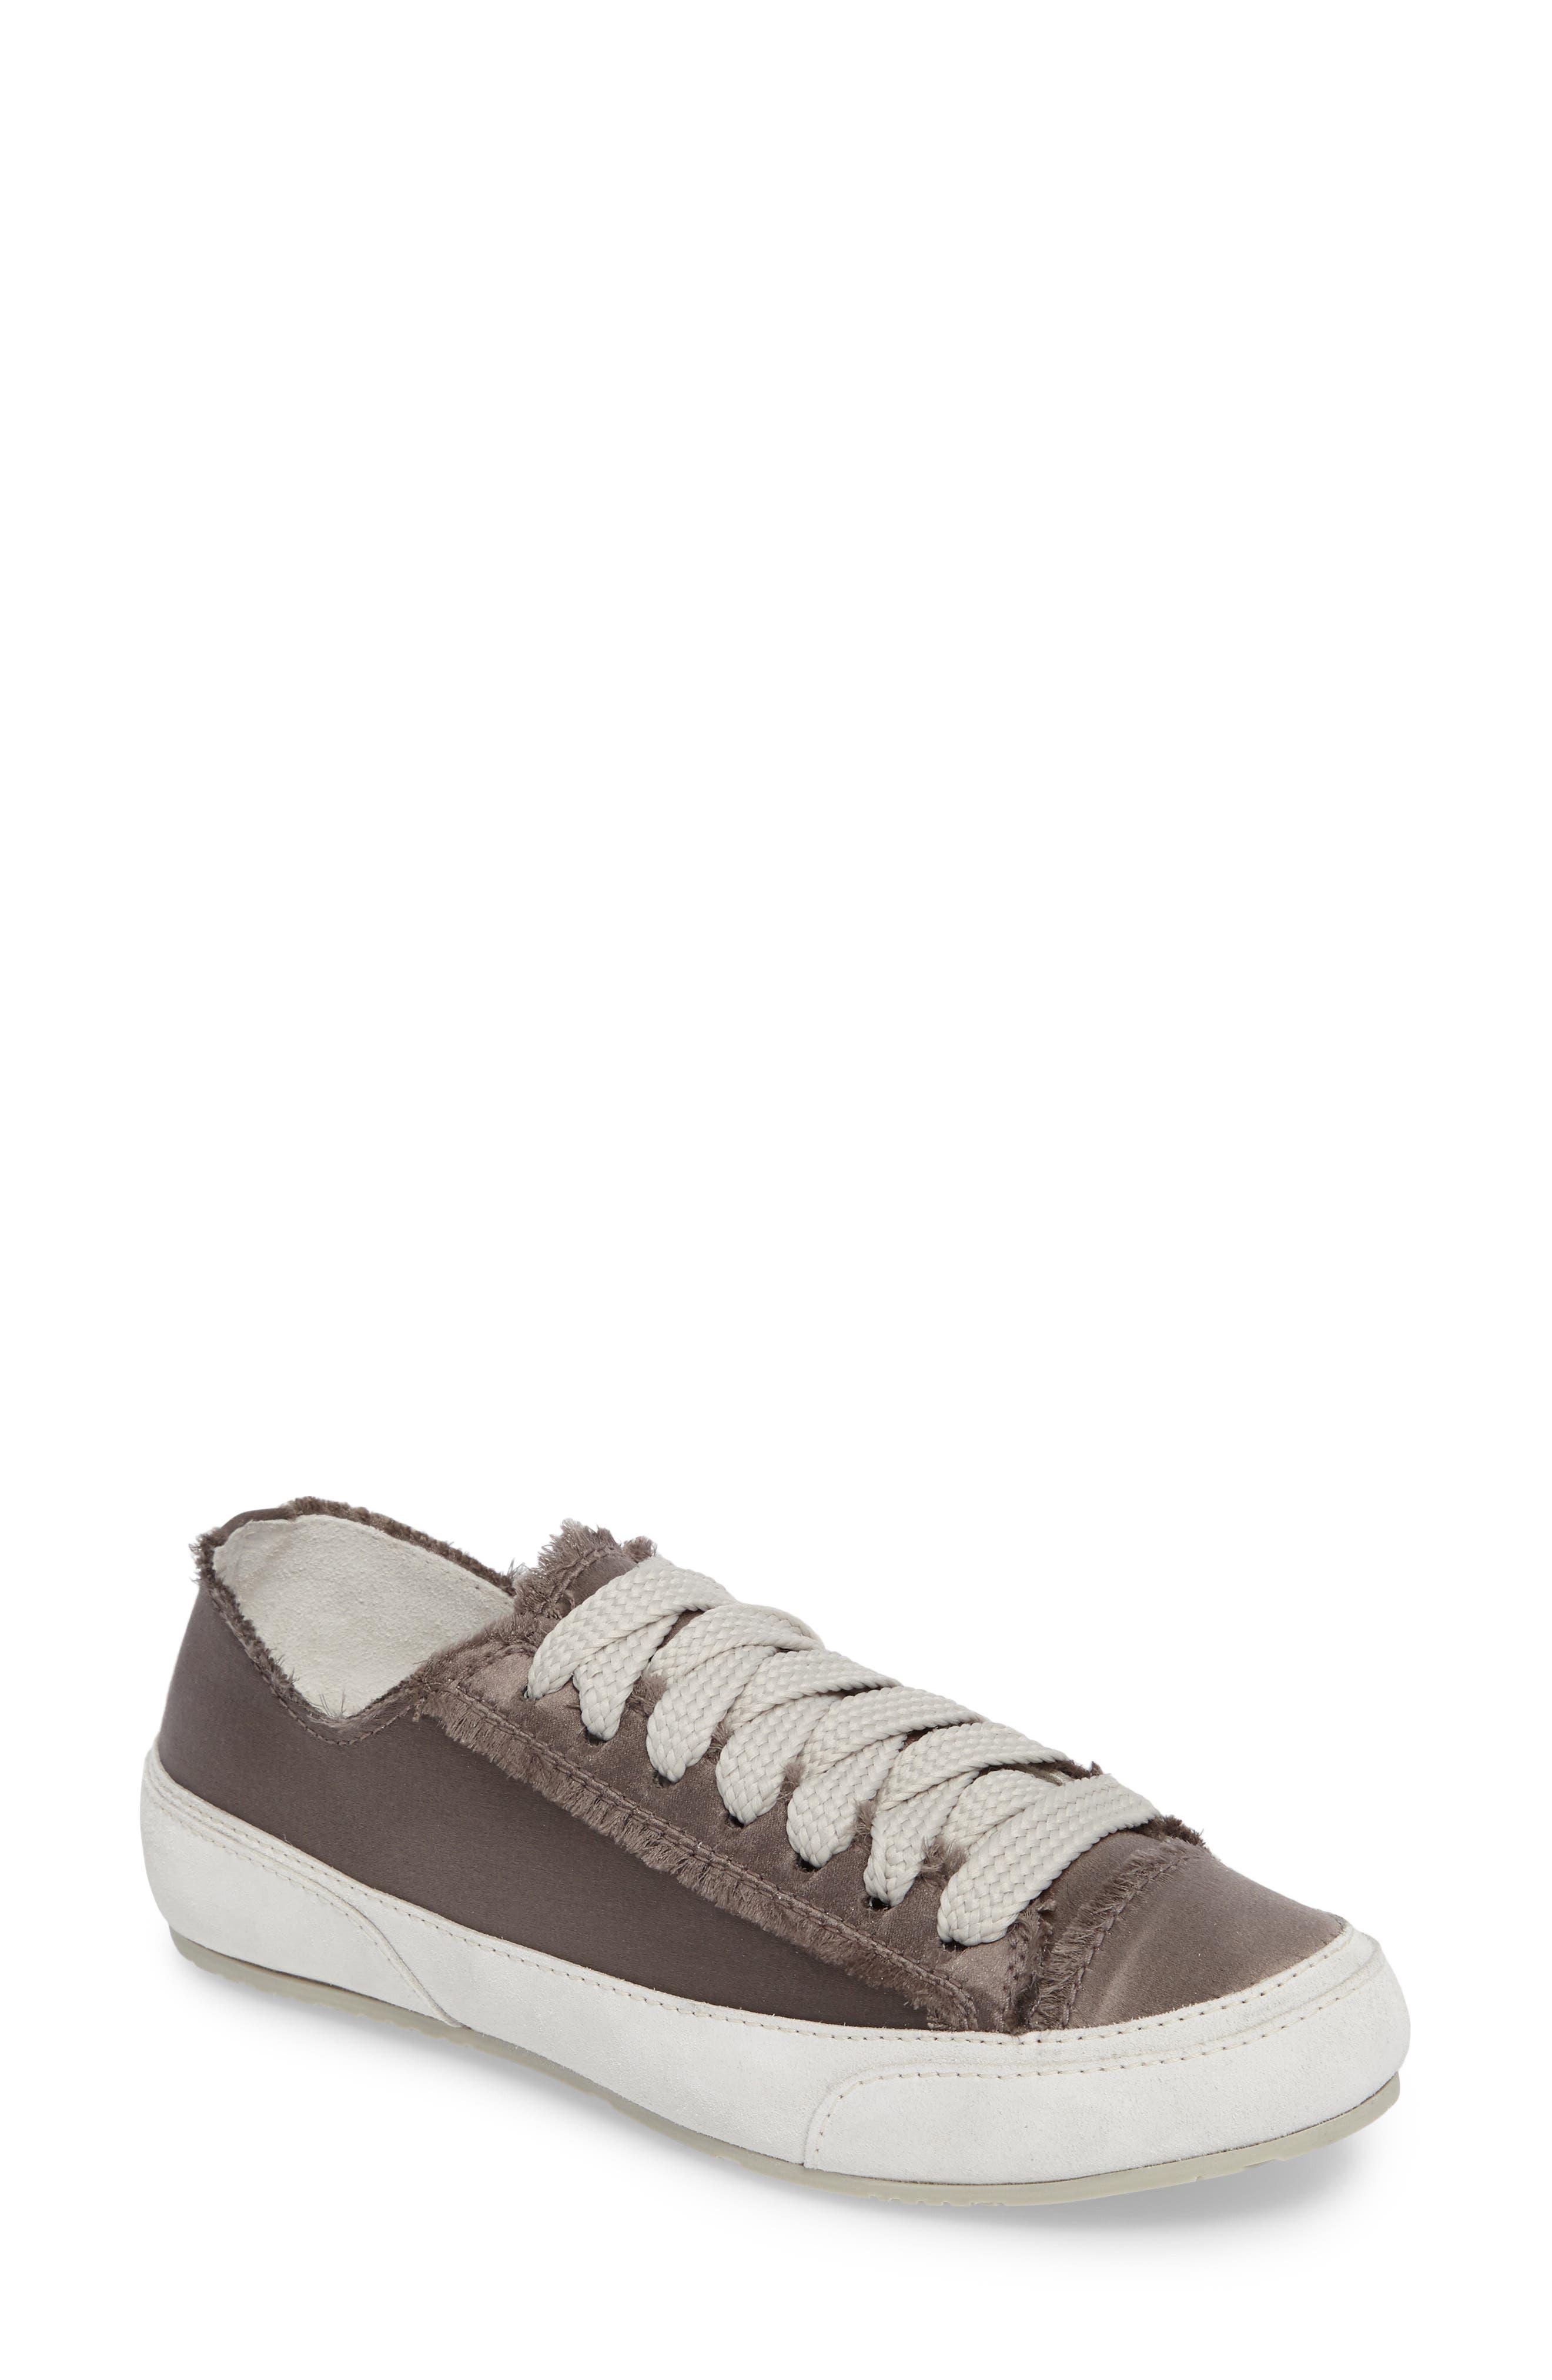 'Parson' Satin Sneaker,                         Main,                         color, Truffle Satin